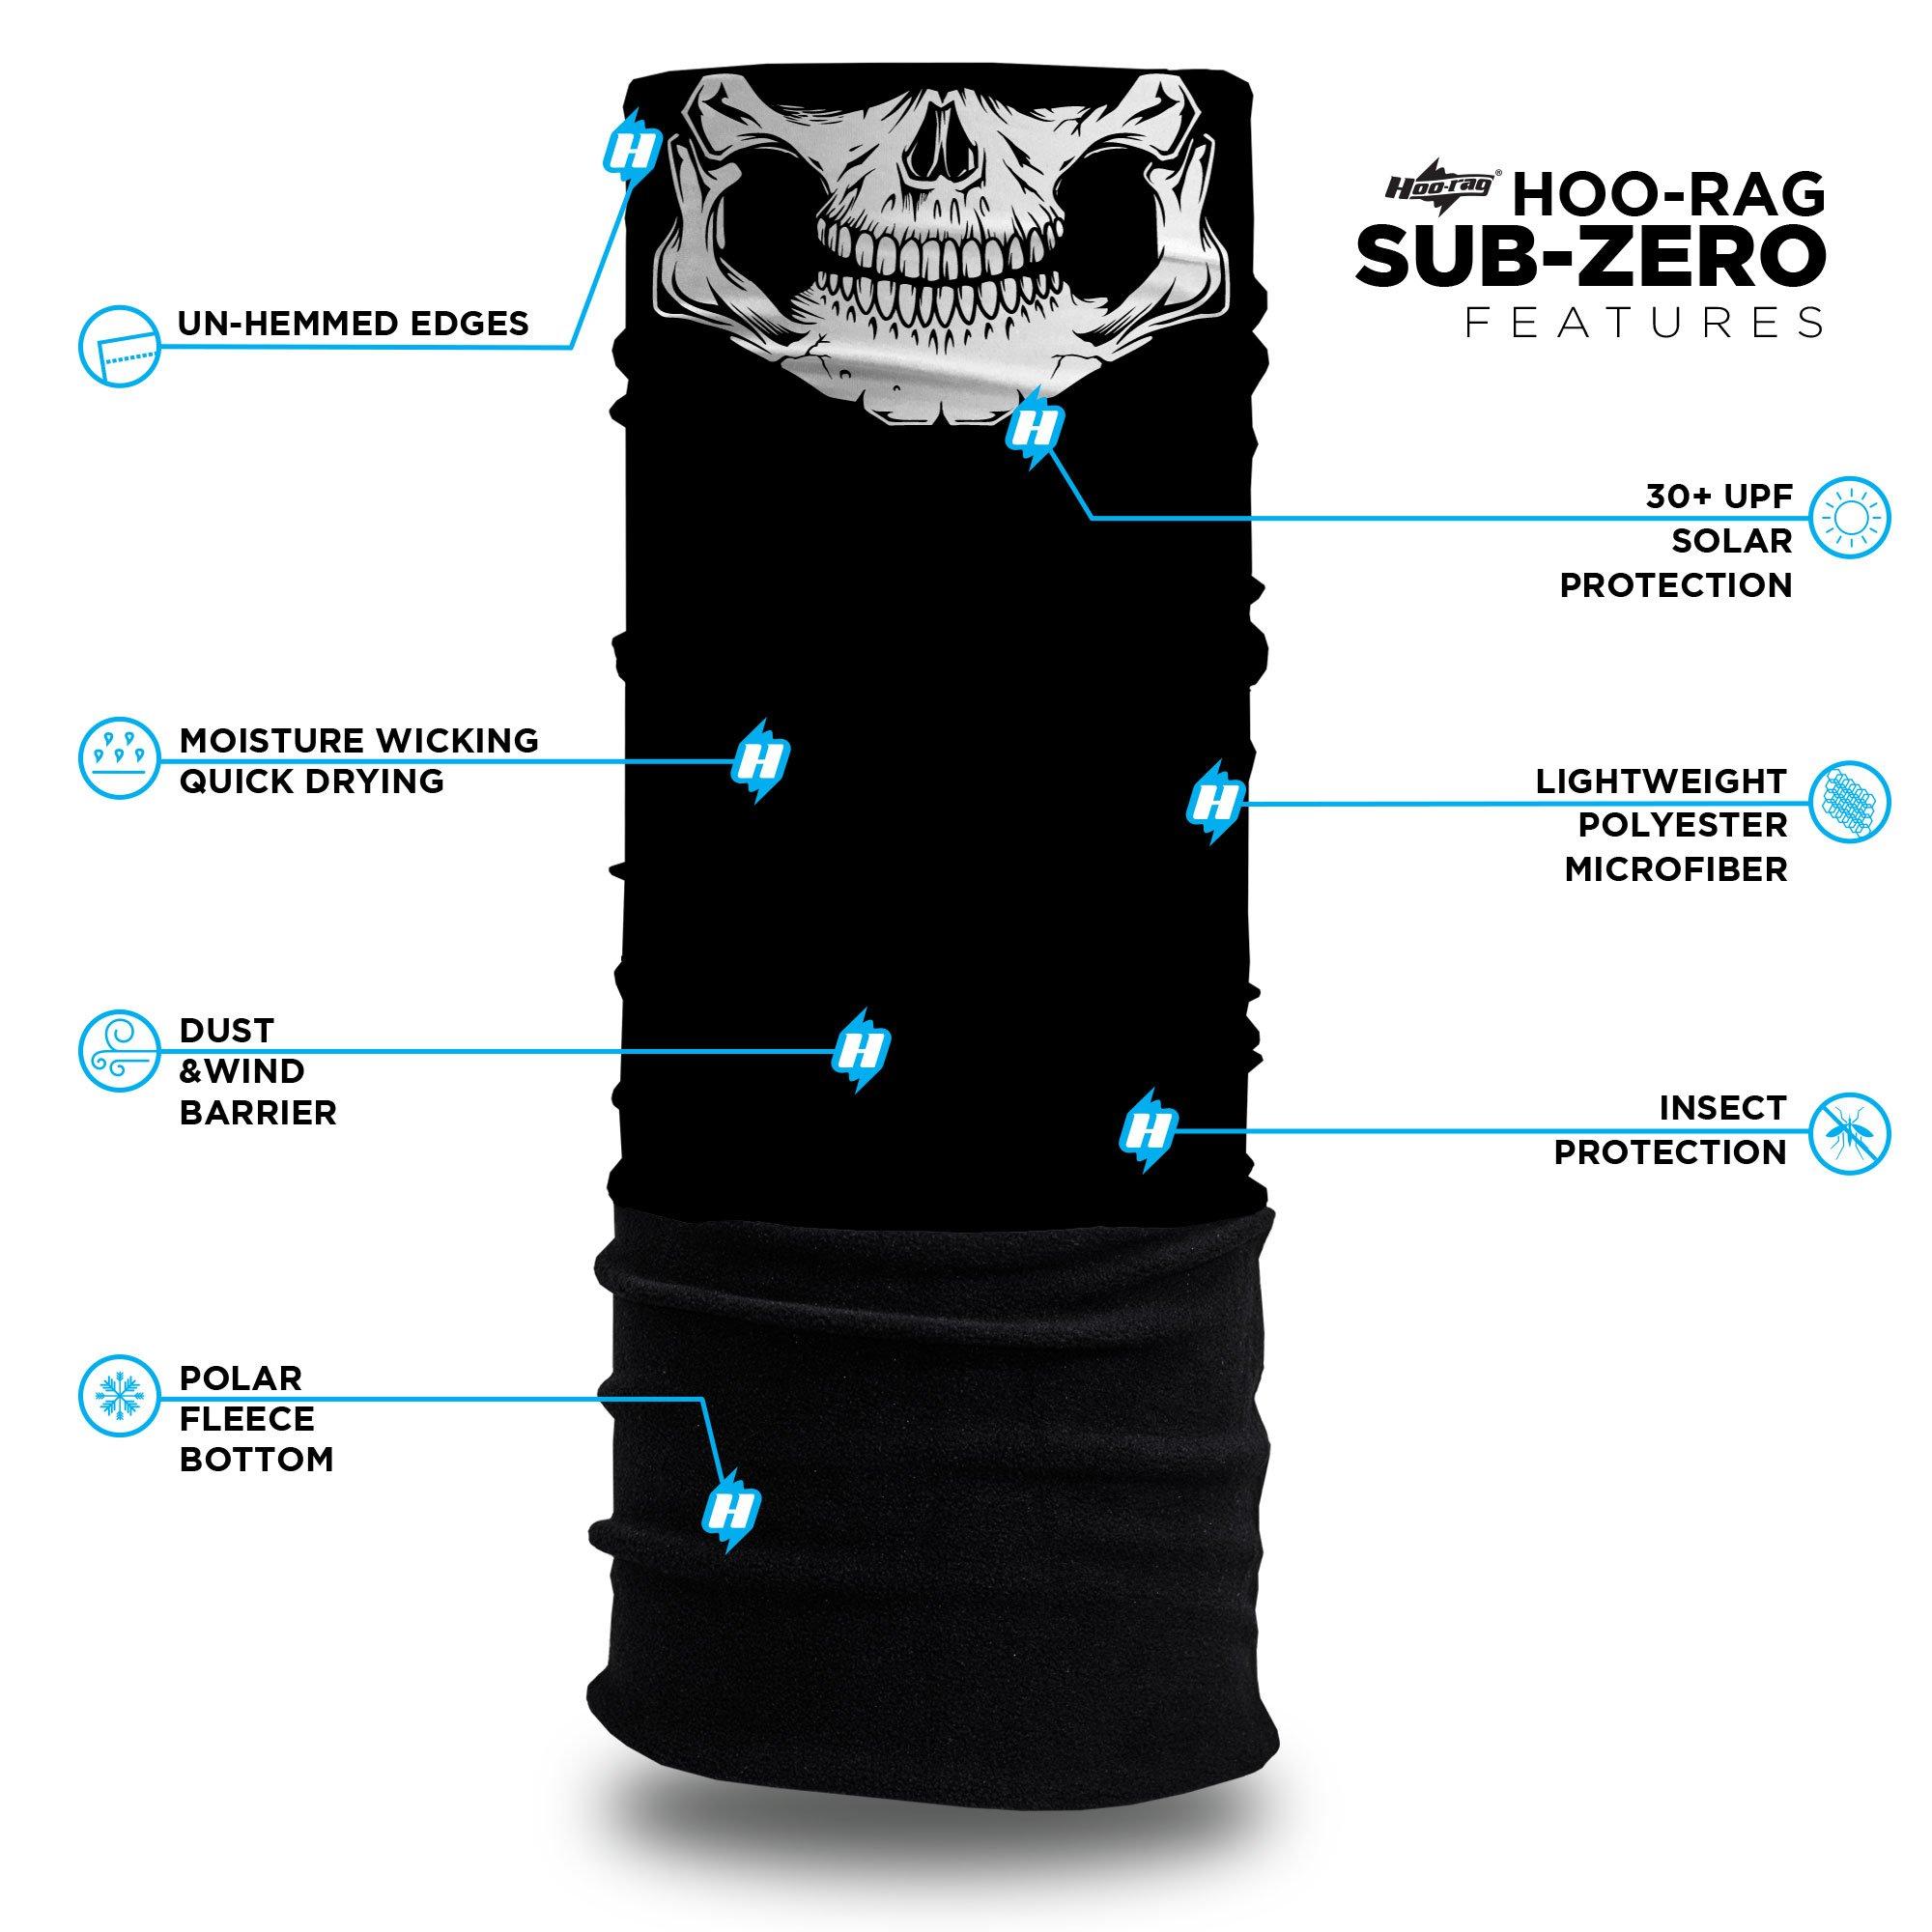 hoorag-sub-zero-skull-daddy-winter-fleece-face-mask-specification